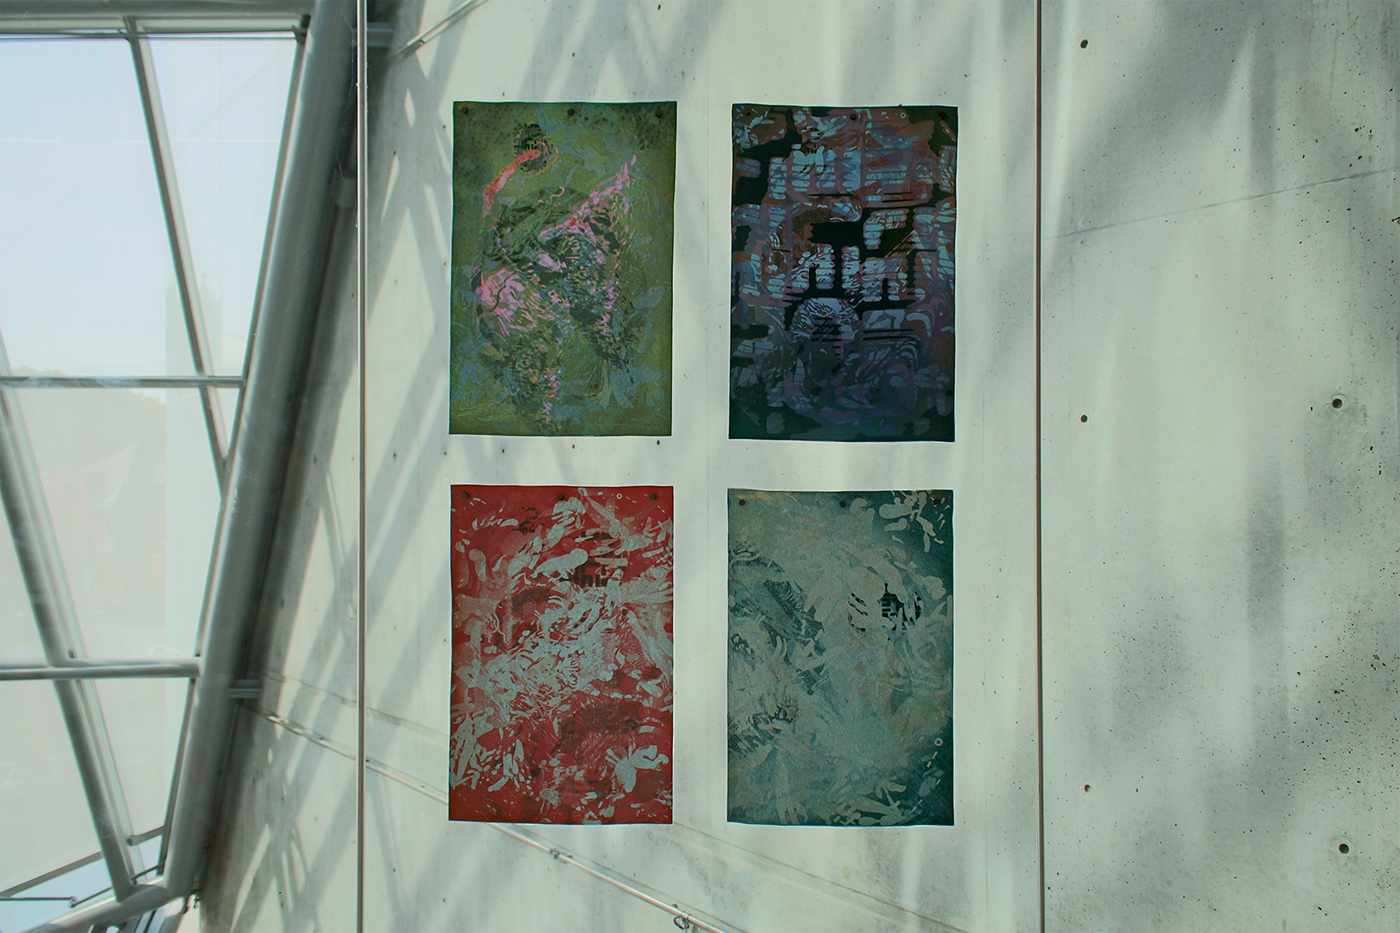 fabric print distortion weeding illustration design abstract visual adobeawards